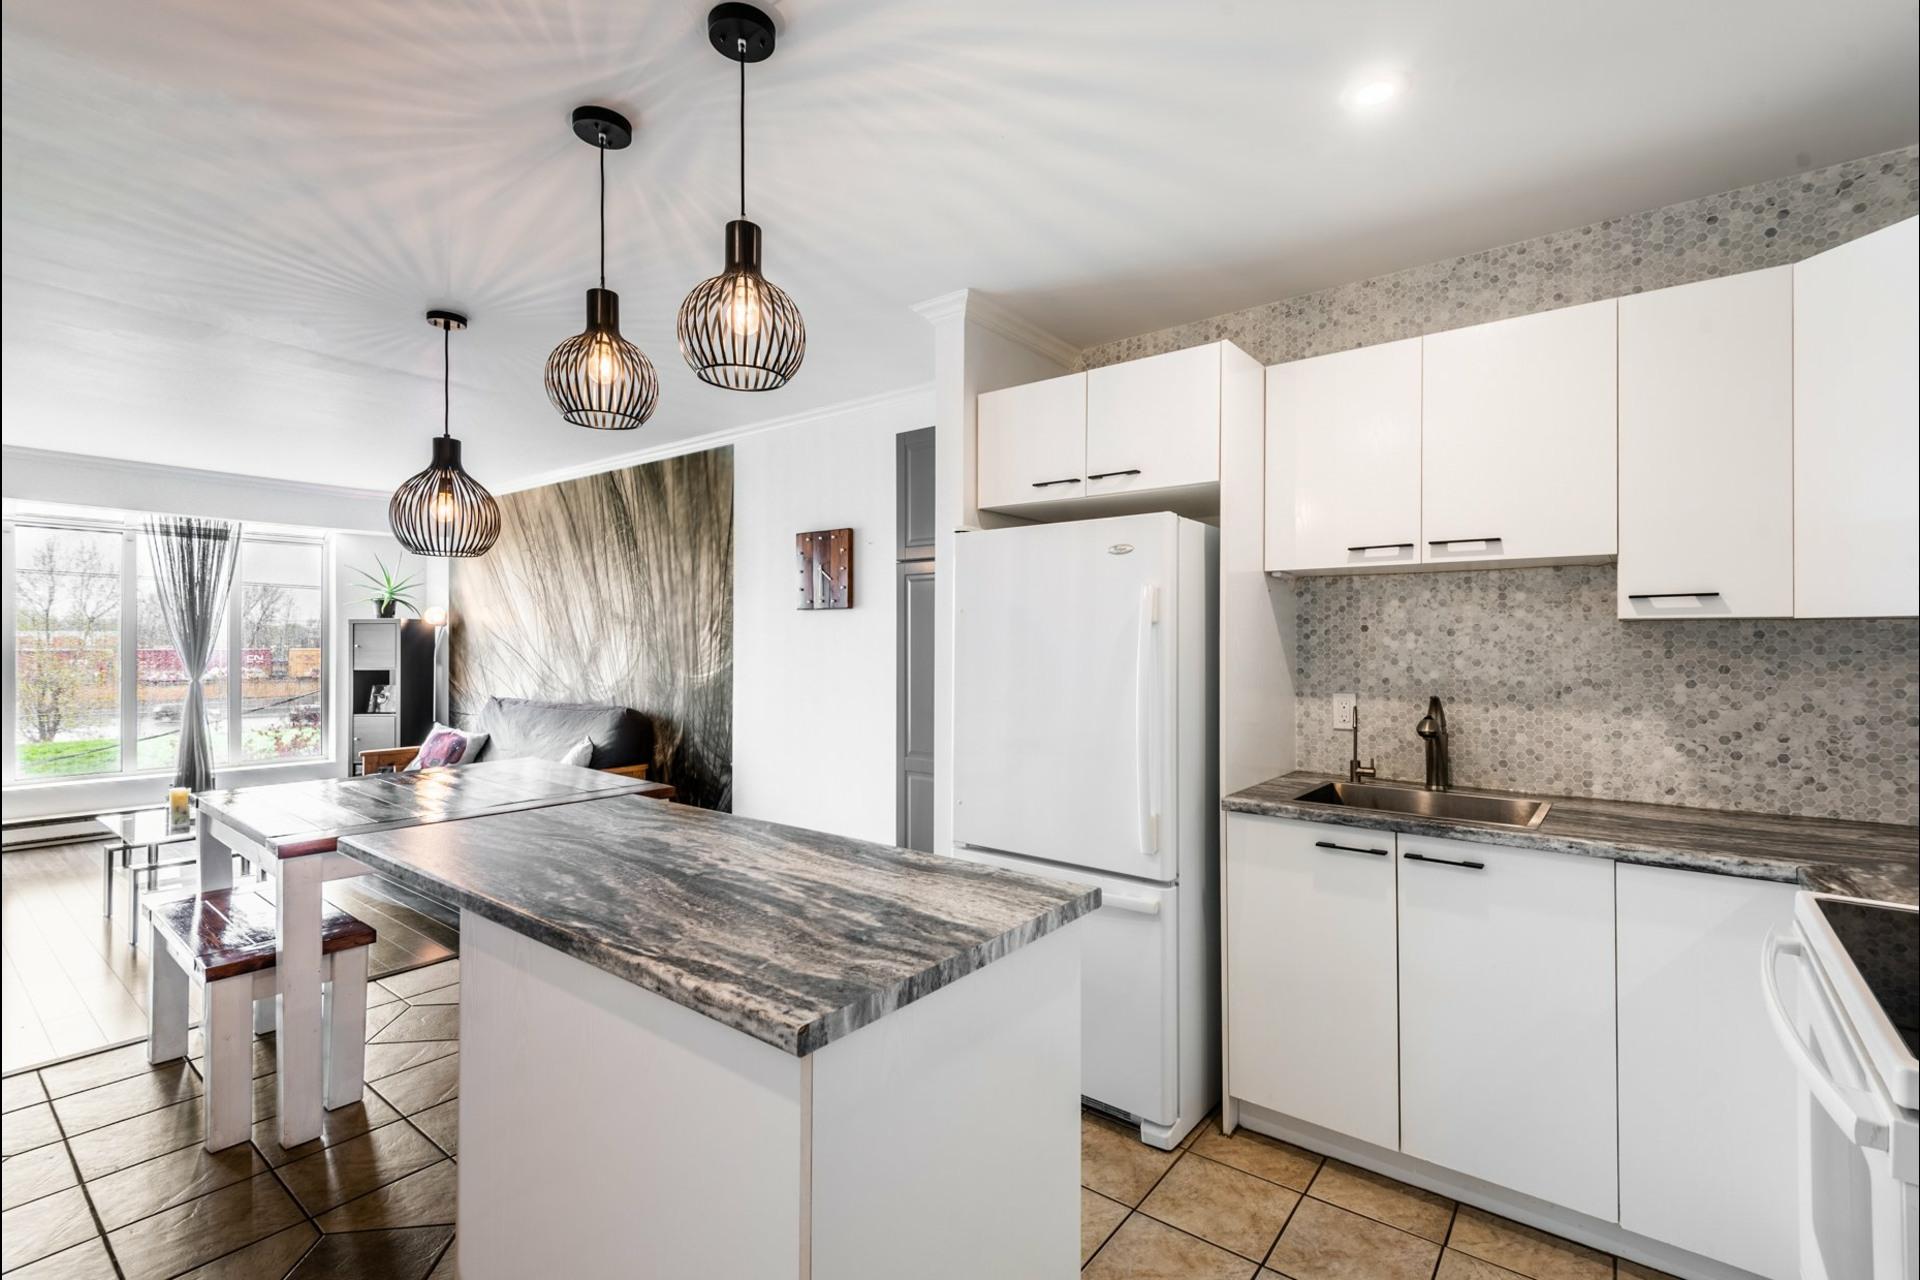 image 7 - Apartment For sale Saint-Hubert Longueuil  - 4 rooms